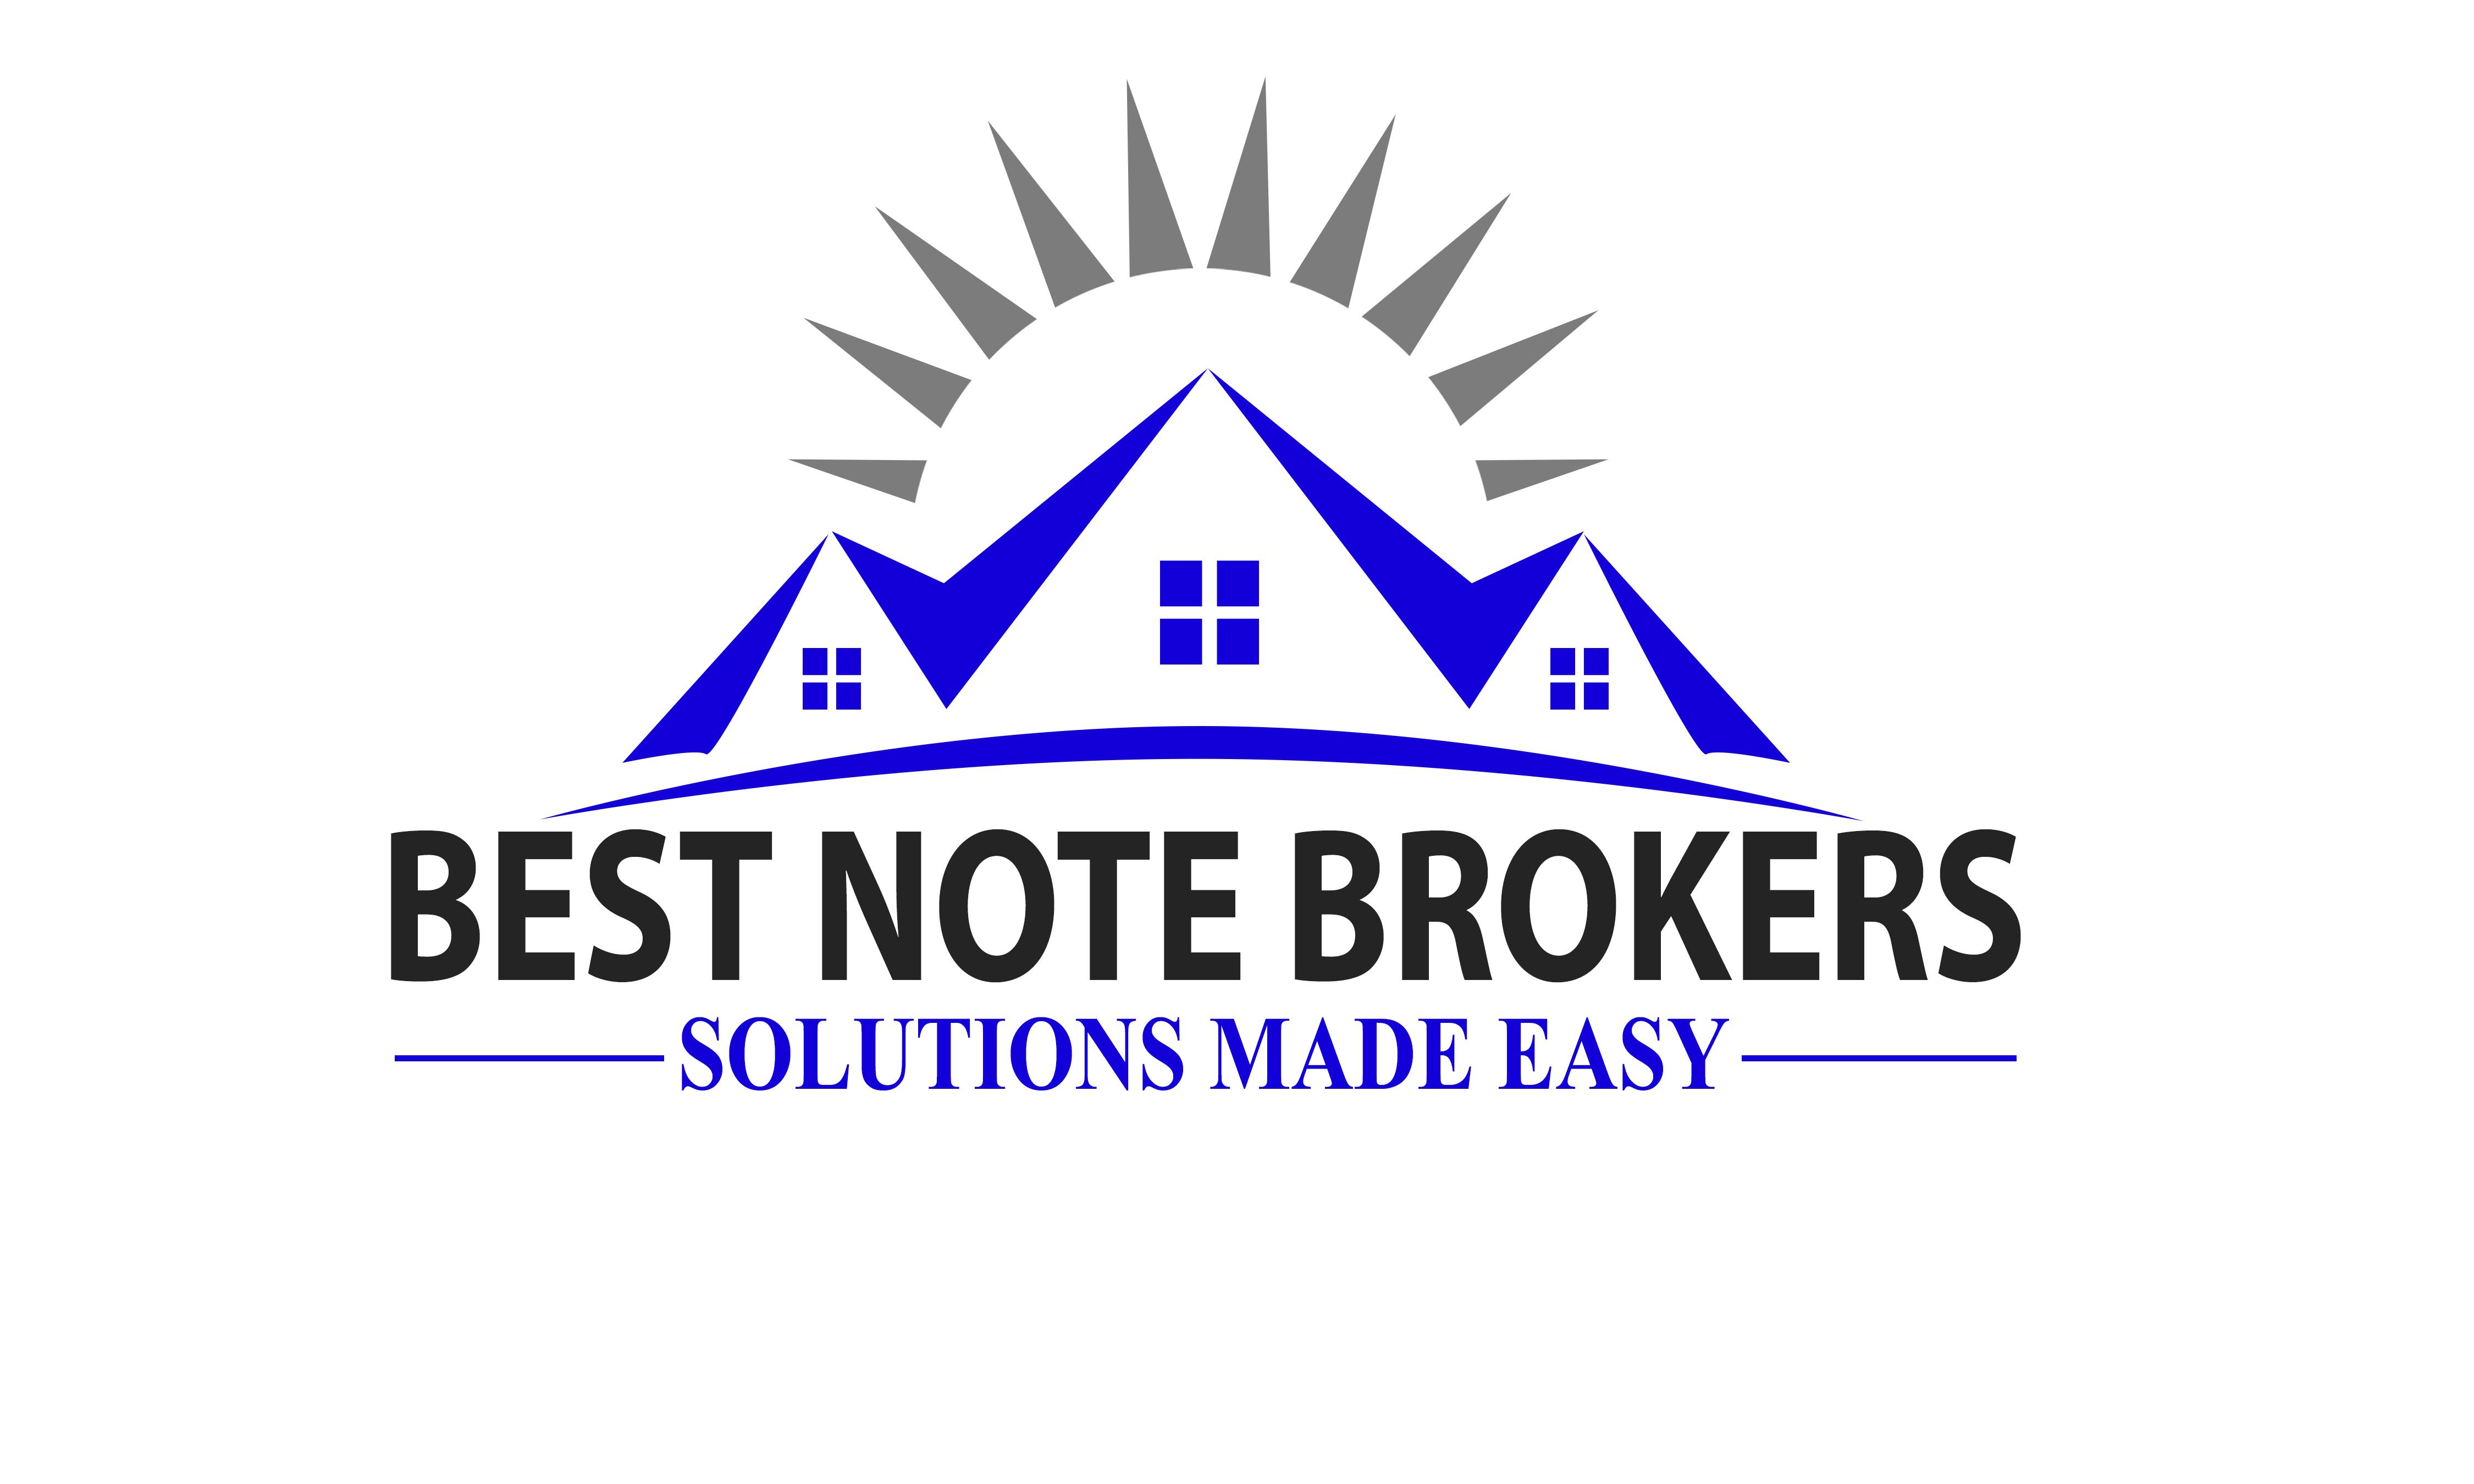 Best Note Brokers image